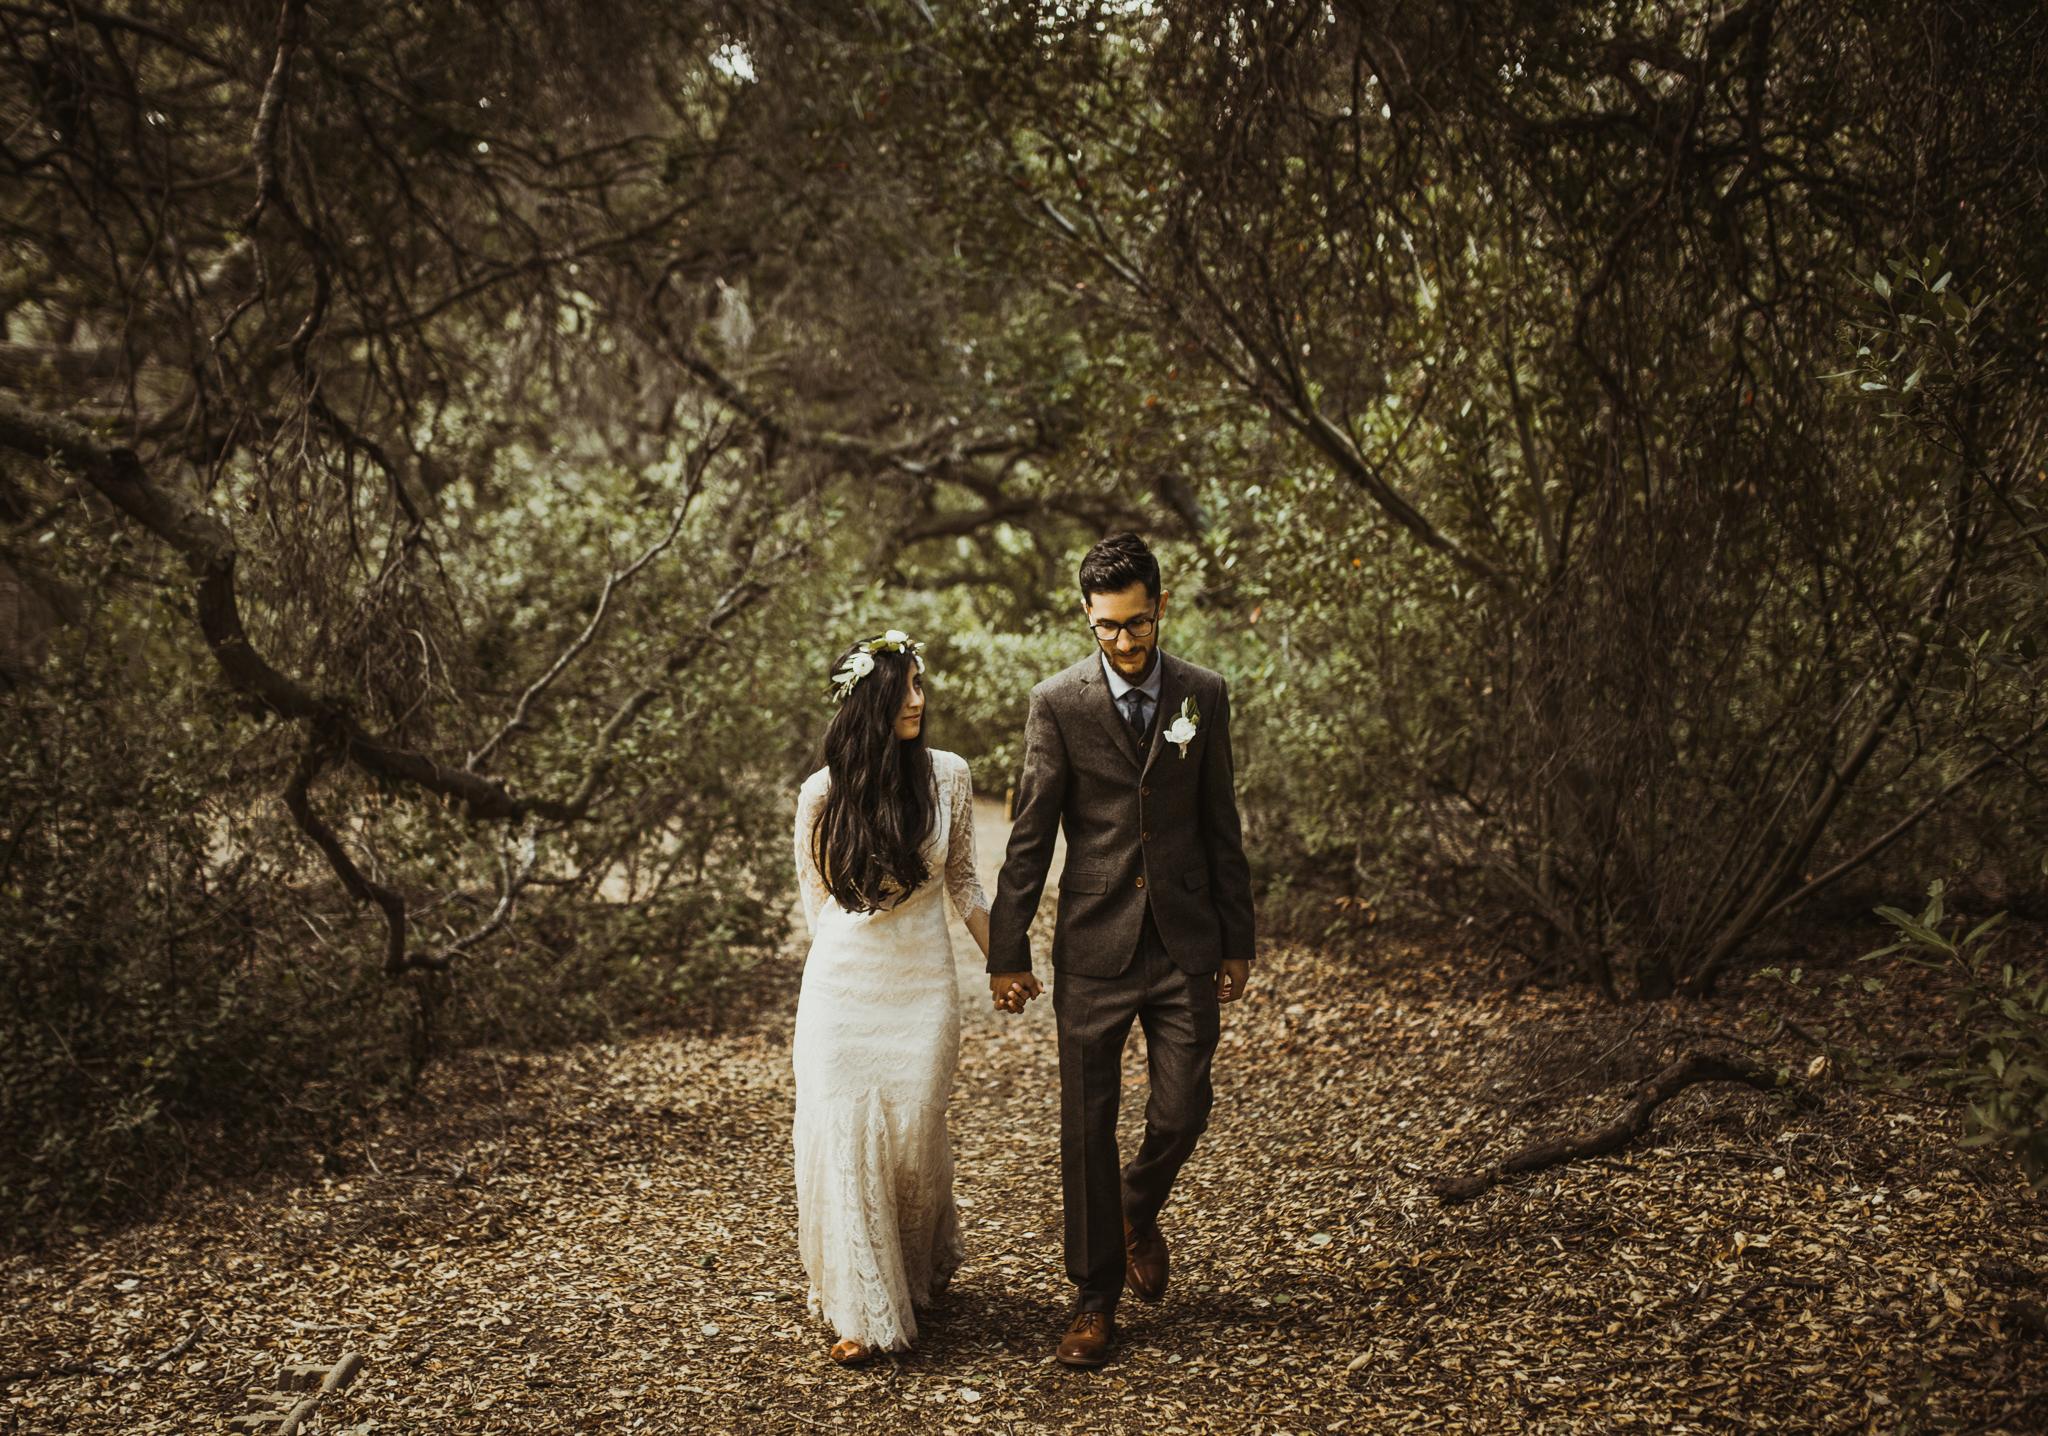 ©Isaiah-&-Taylor-Photography---Oak-Canyon-Nature-Center-Wedding,-Anaheim-Hills-020.jpg